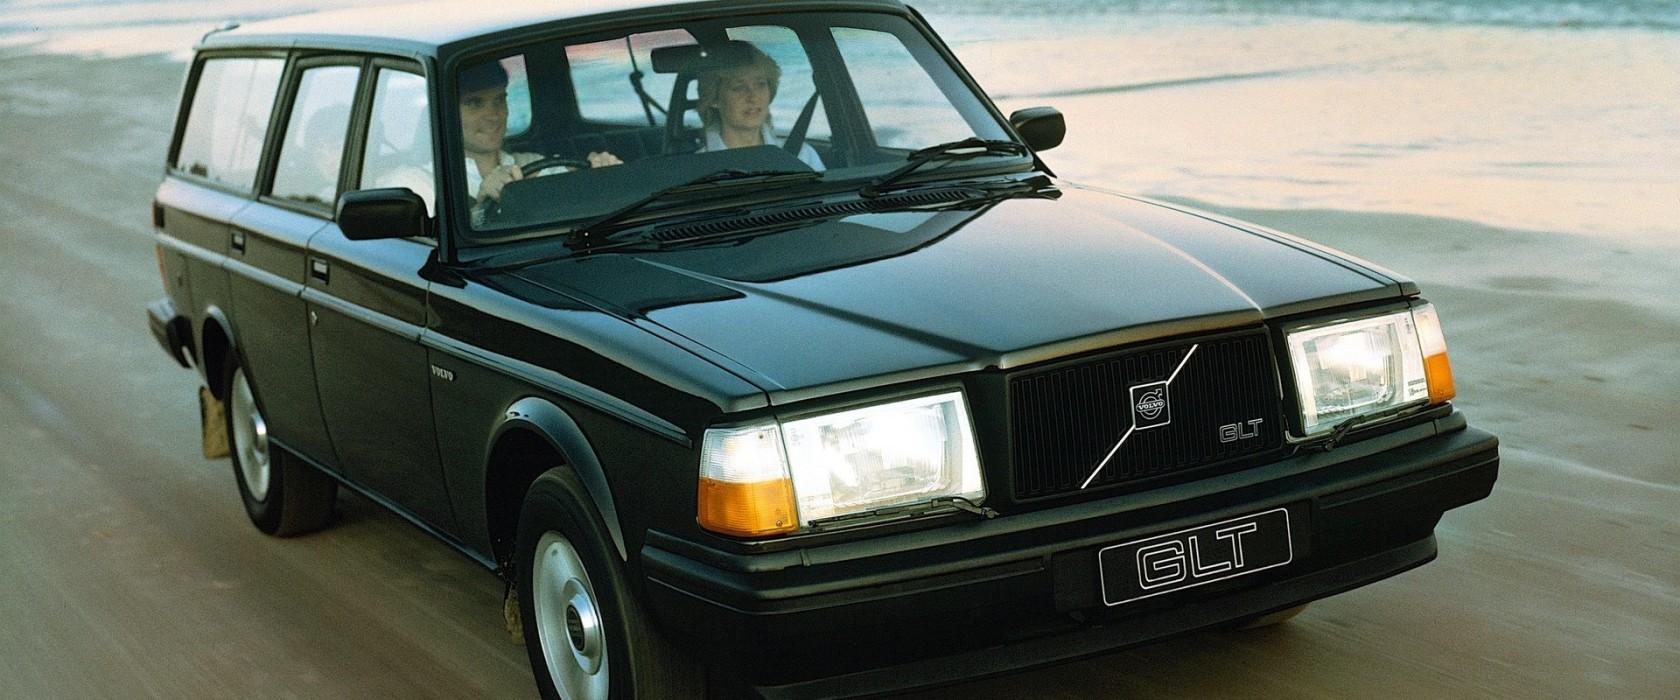 Volvo245-001